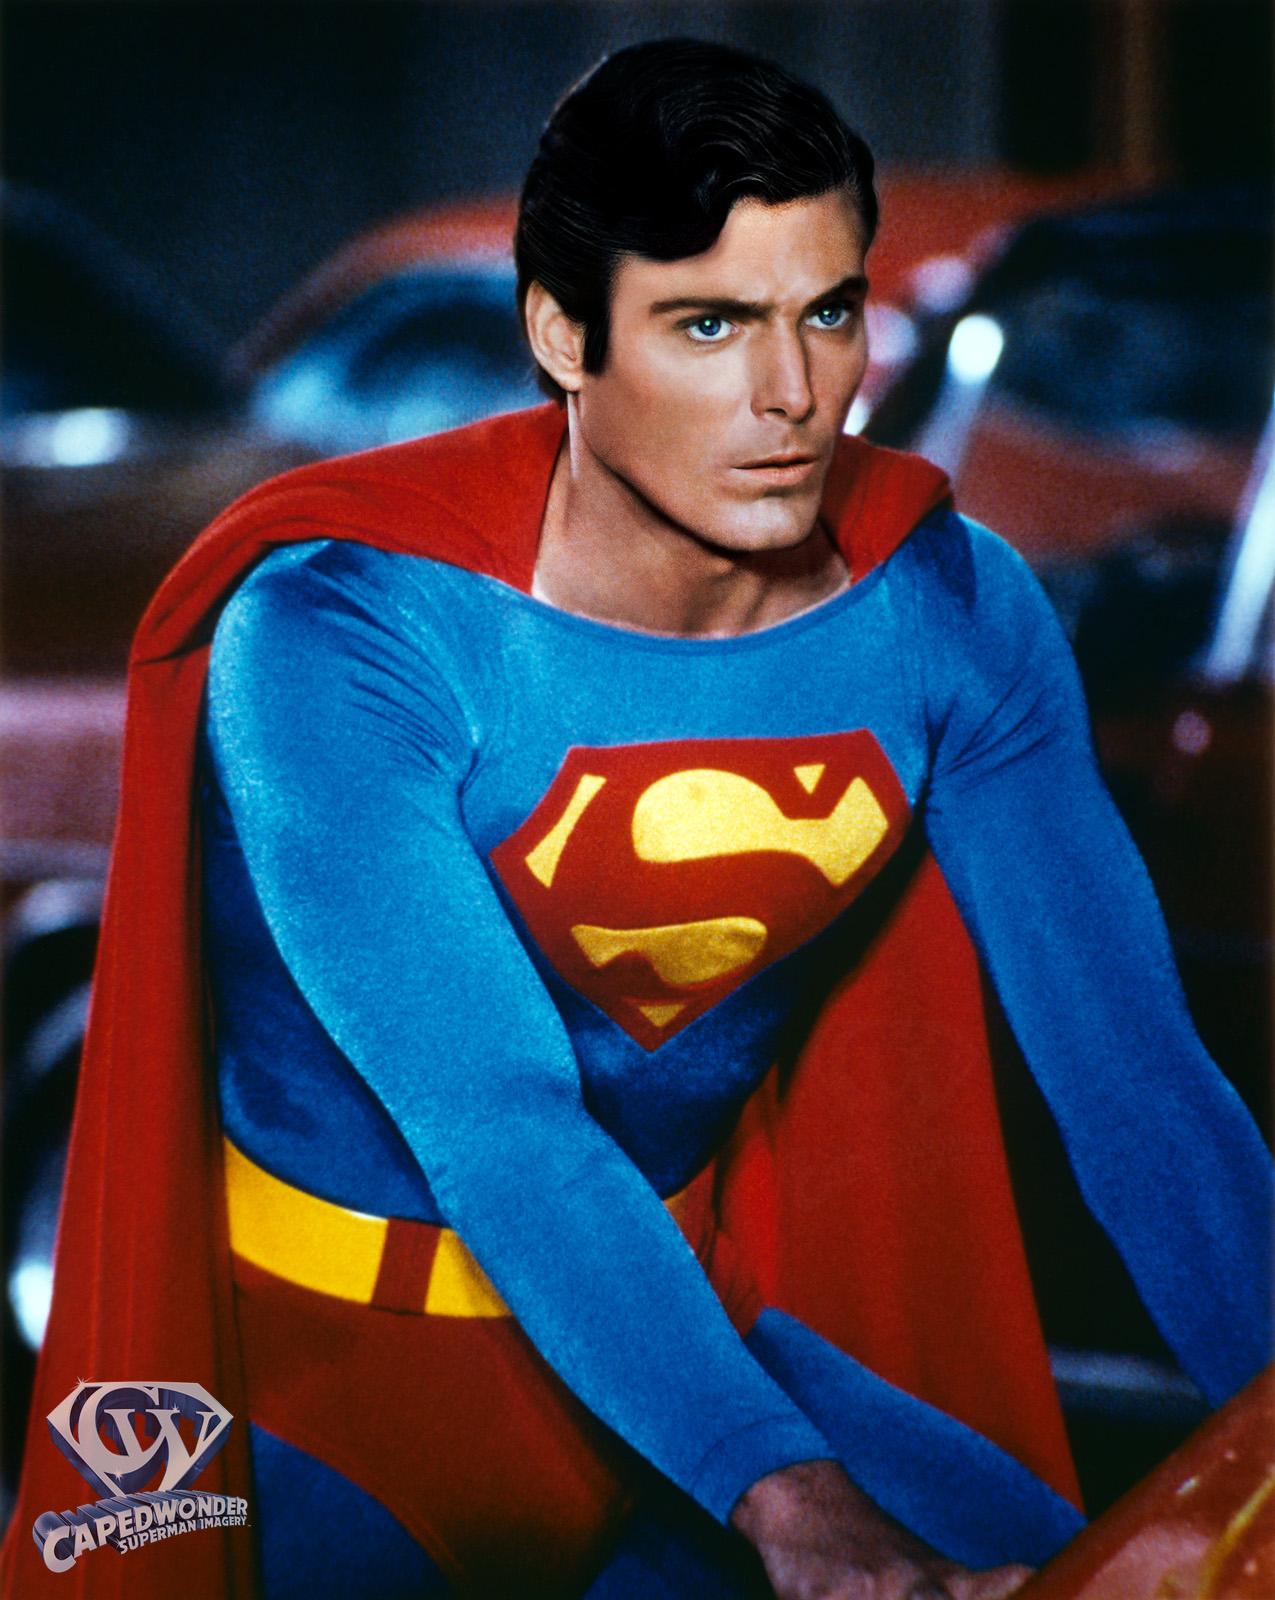 CW-SIV-Superman-car-crush-NMI-cut-scene